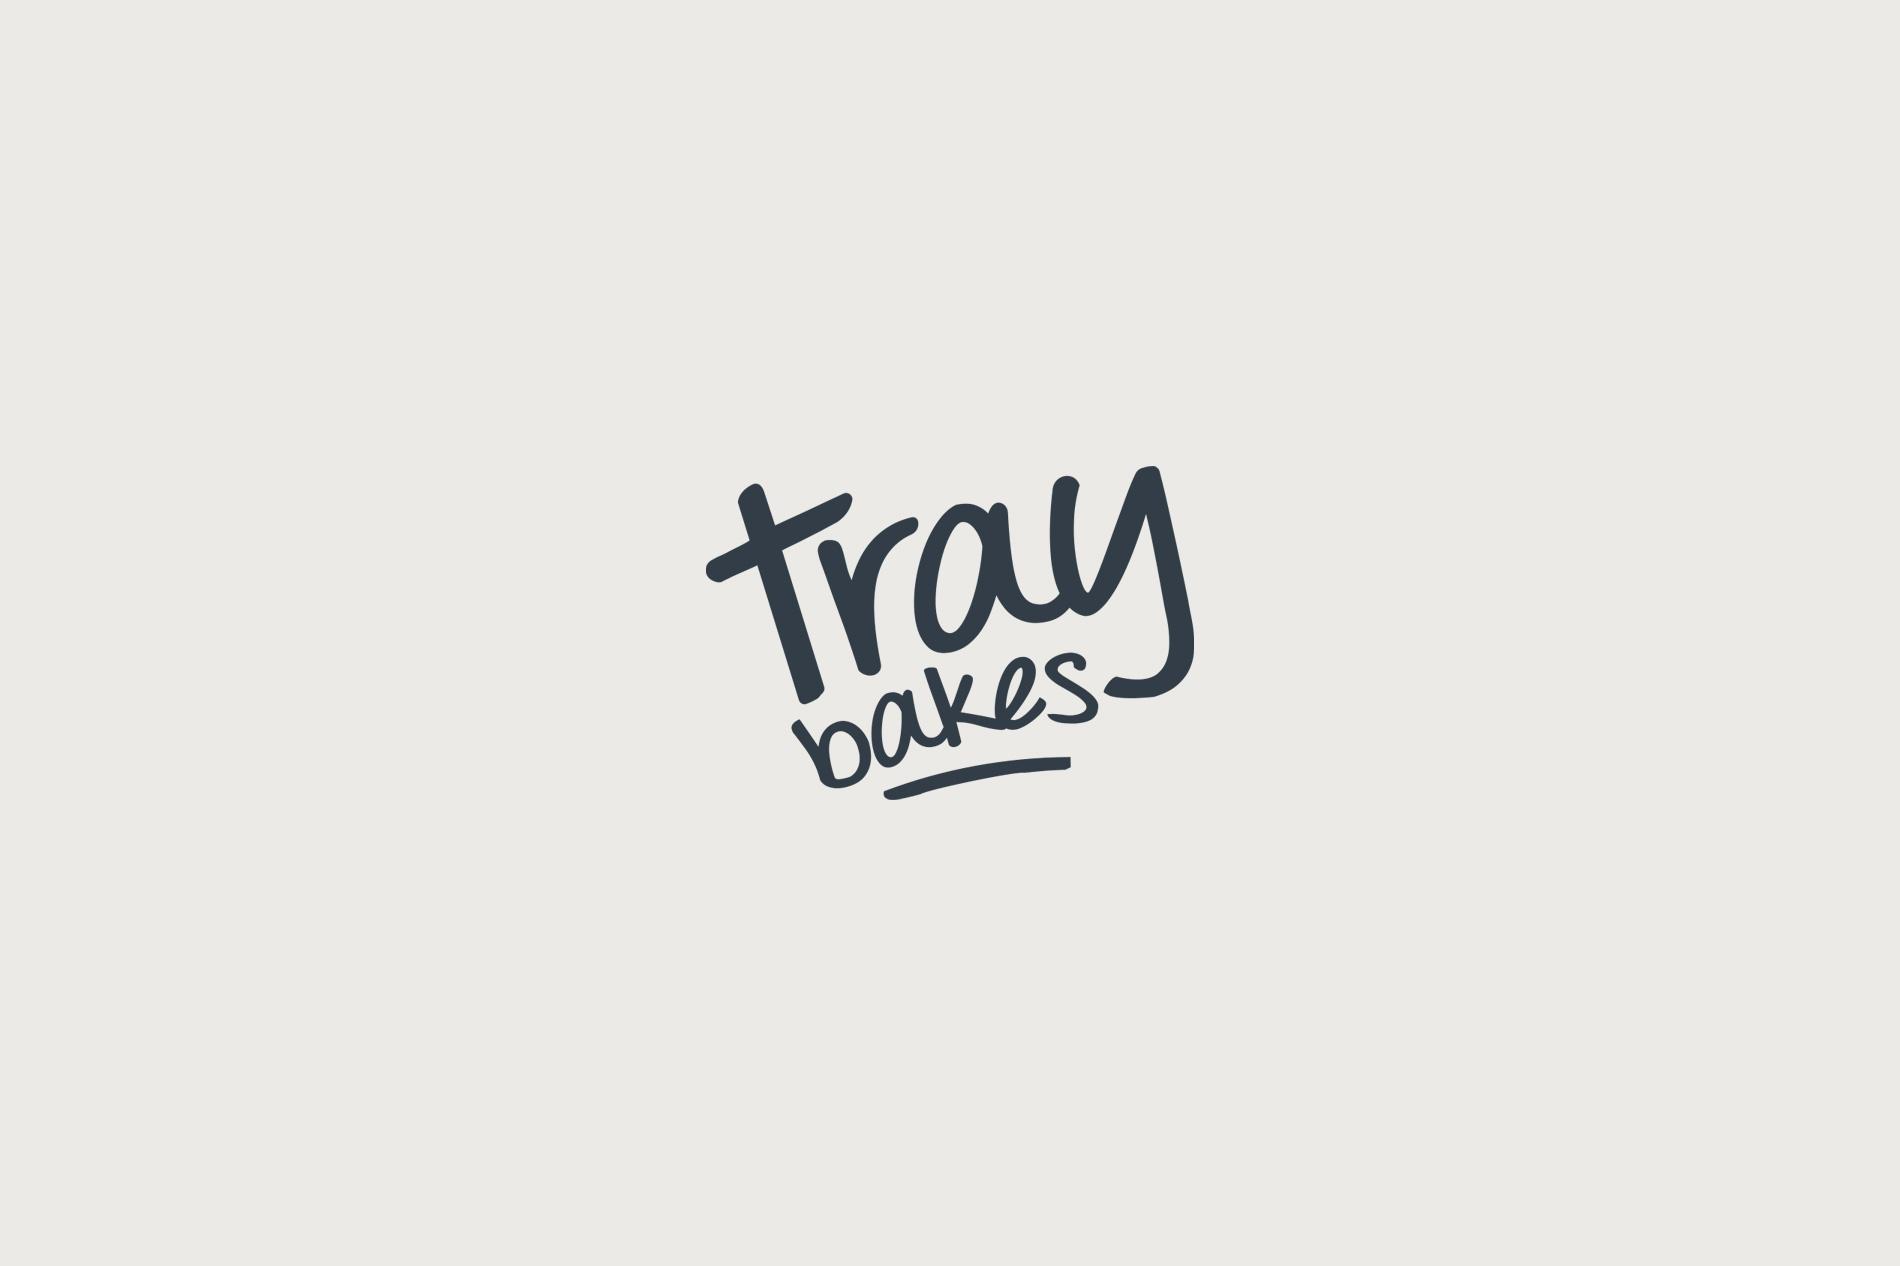 Traybakes logo design, business brand identity